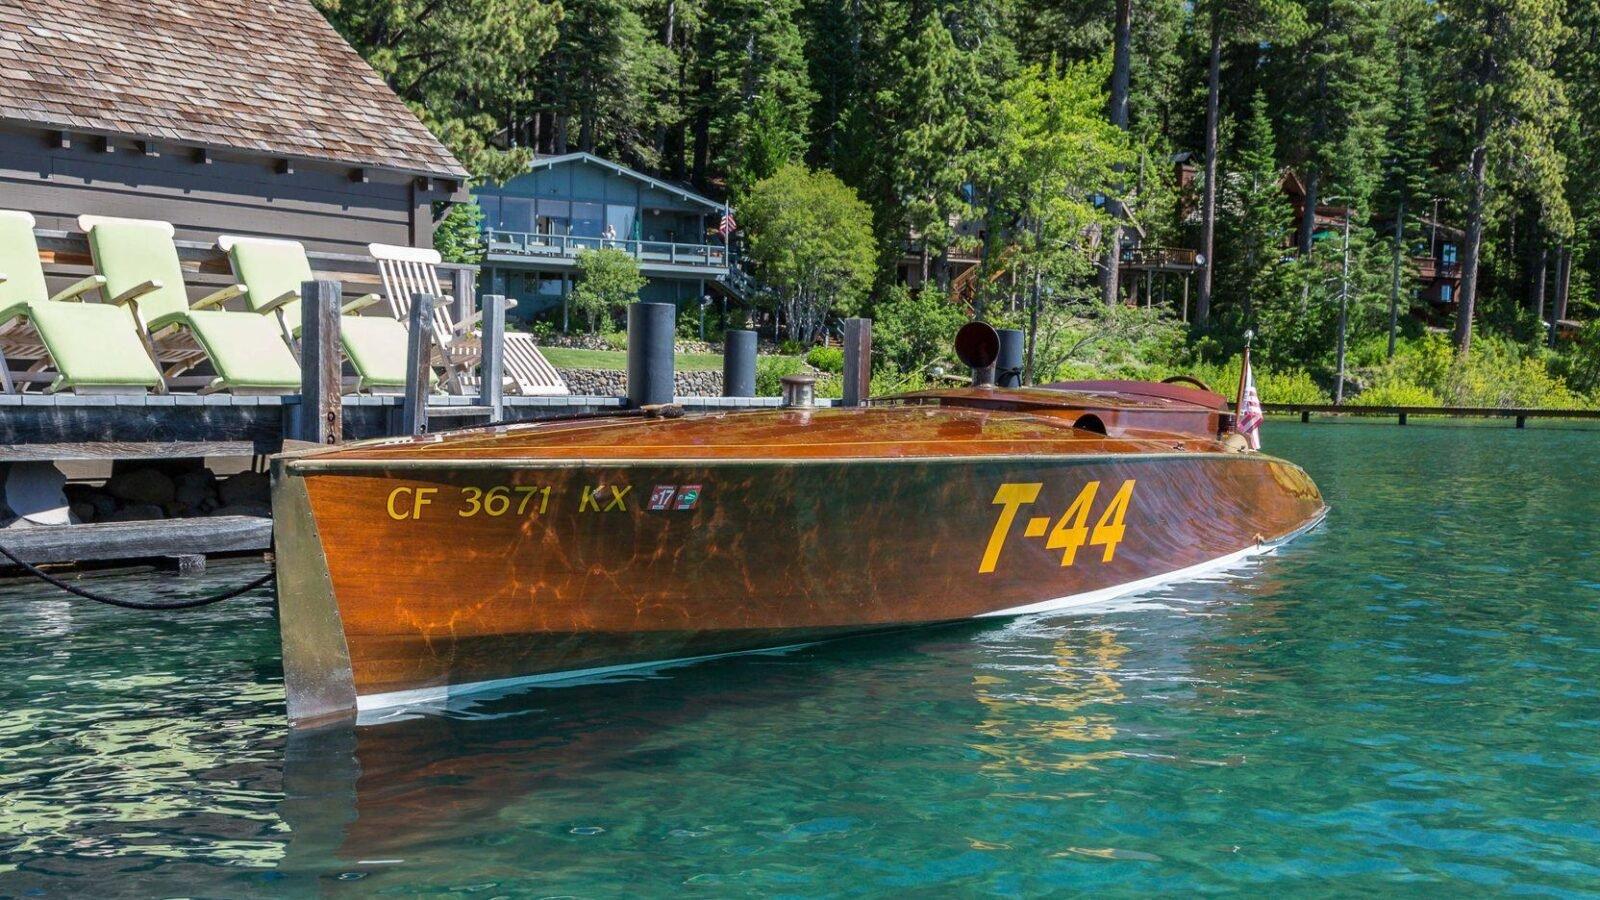 mahogany speed boat 4 1600x900 - 27 Liter V12 Brown & Bassett Gentleman's Racer